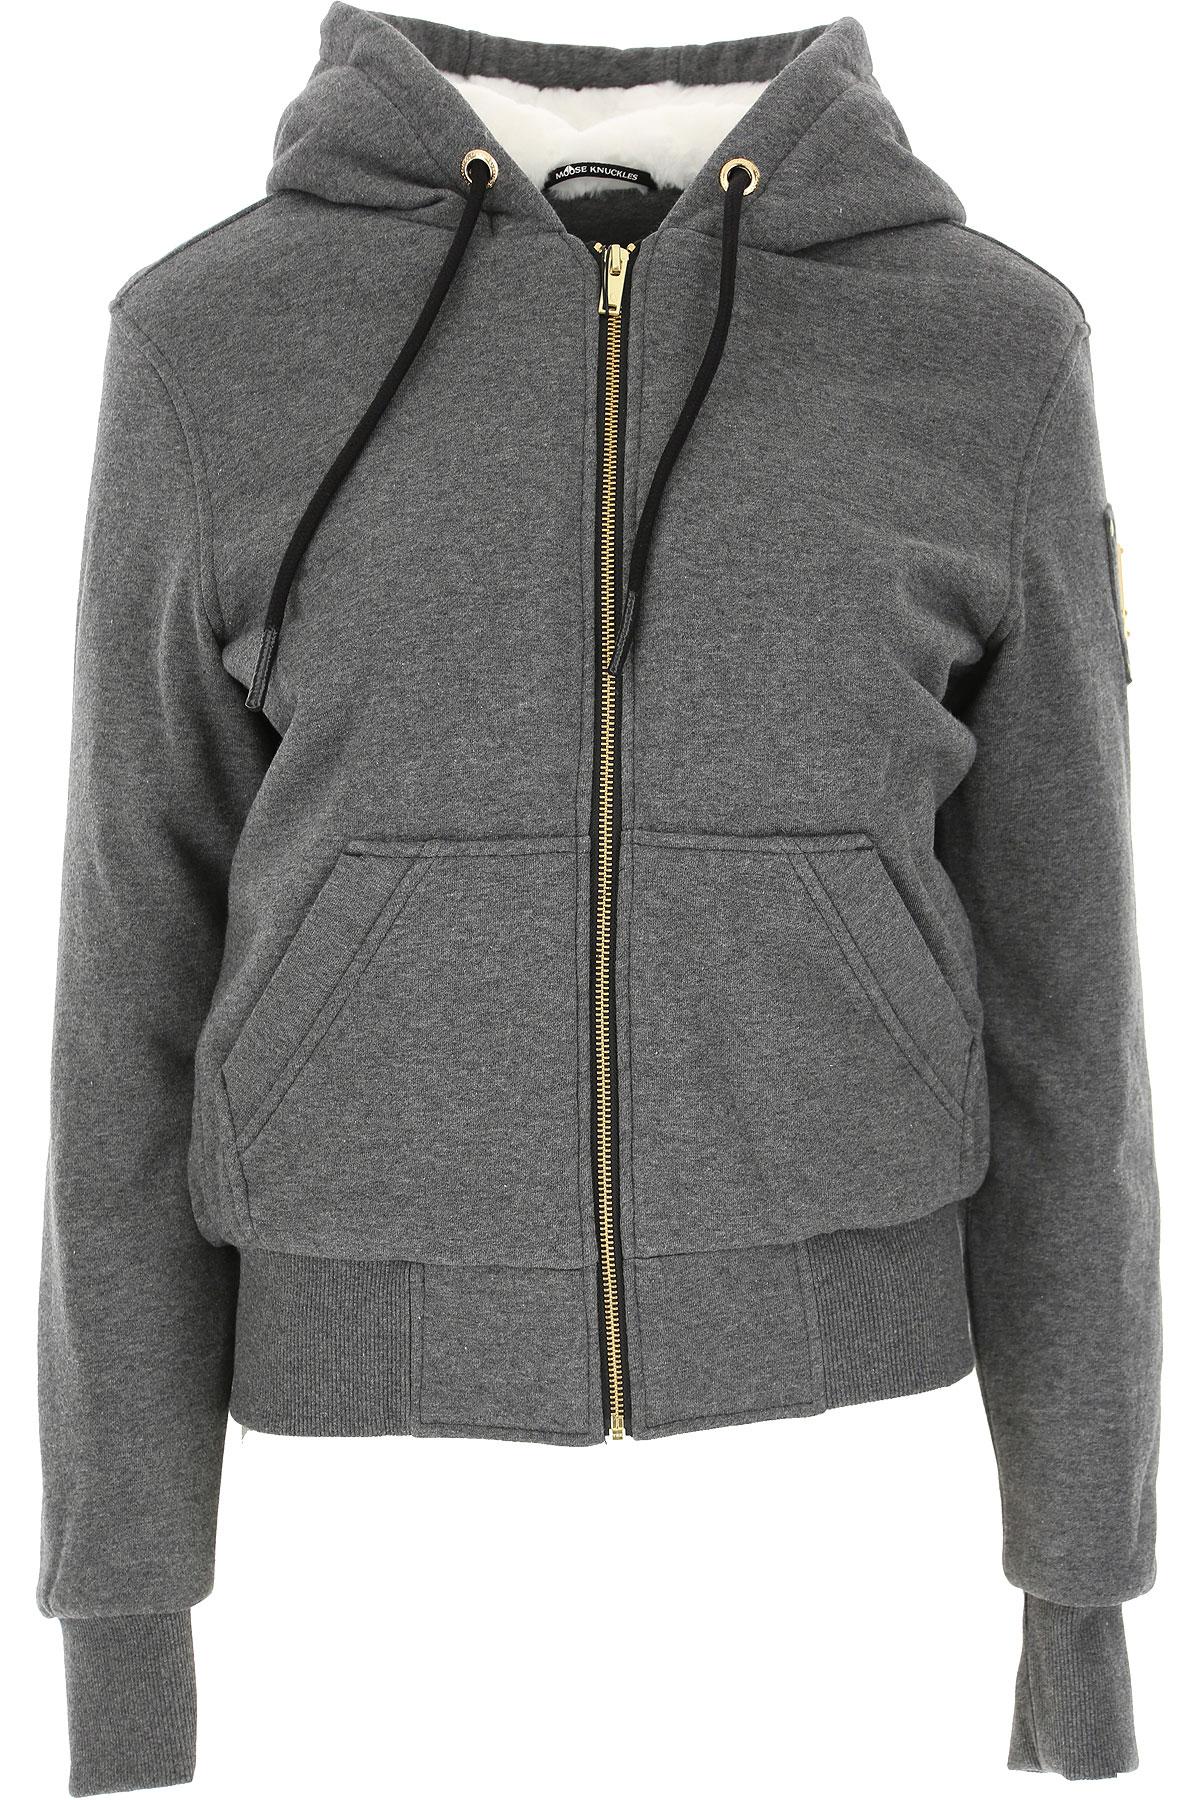 Moose Knuckles Jacket for Women On Sale, Grey, Cotton, 2019, 2 4 6